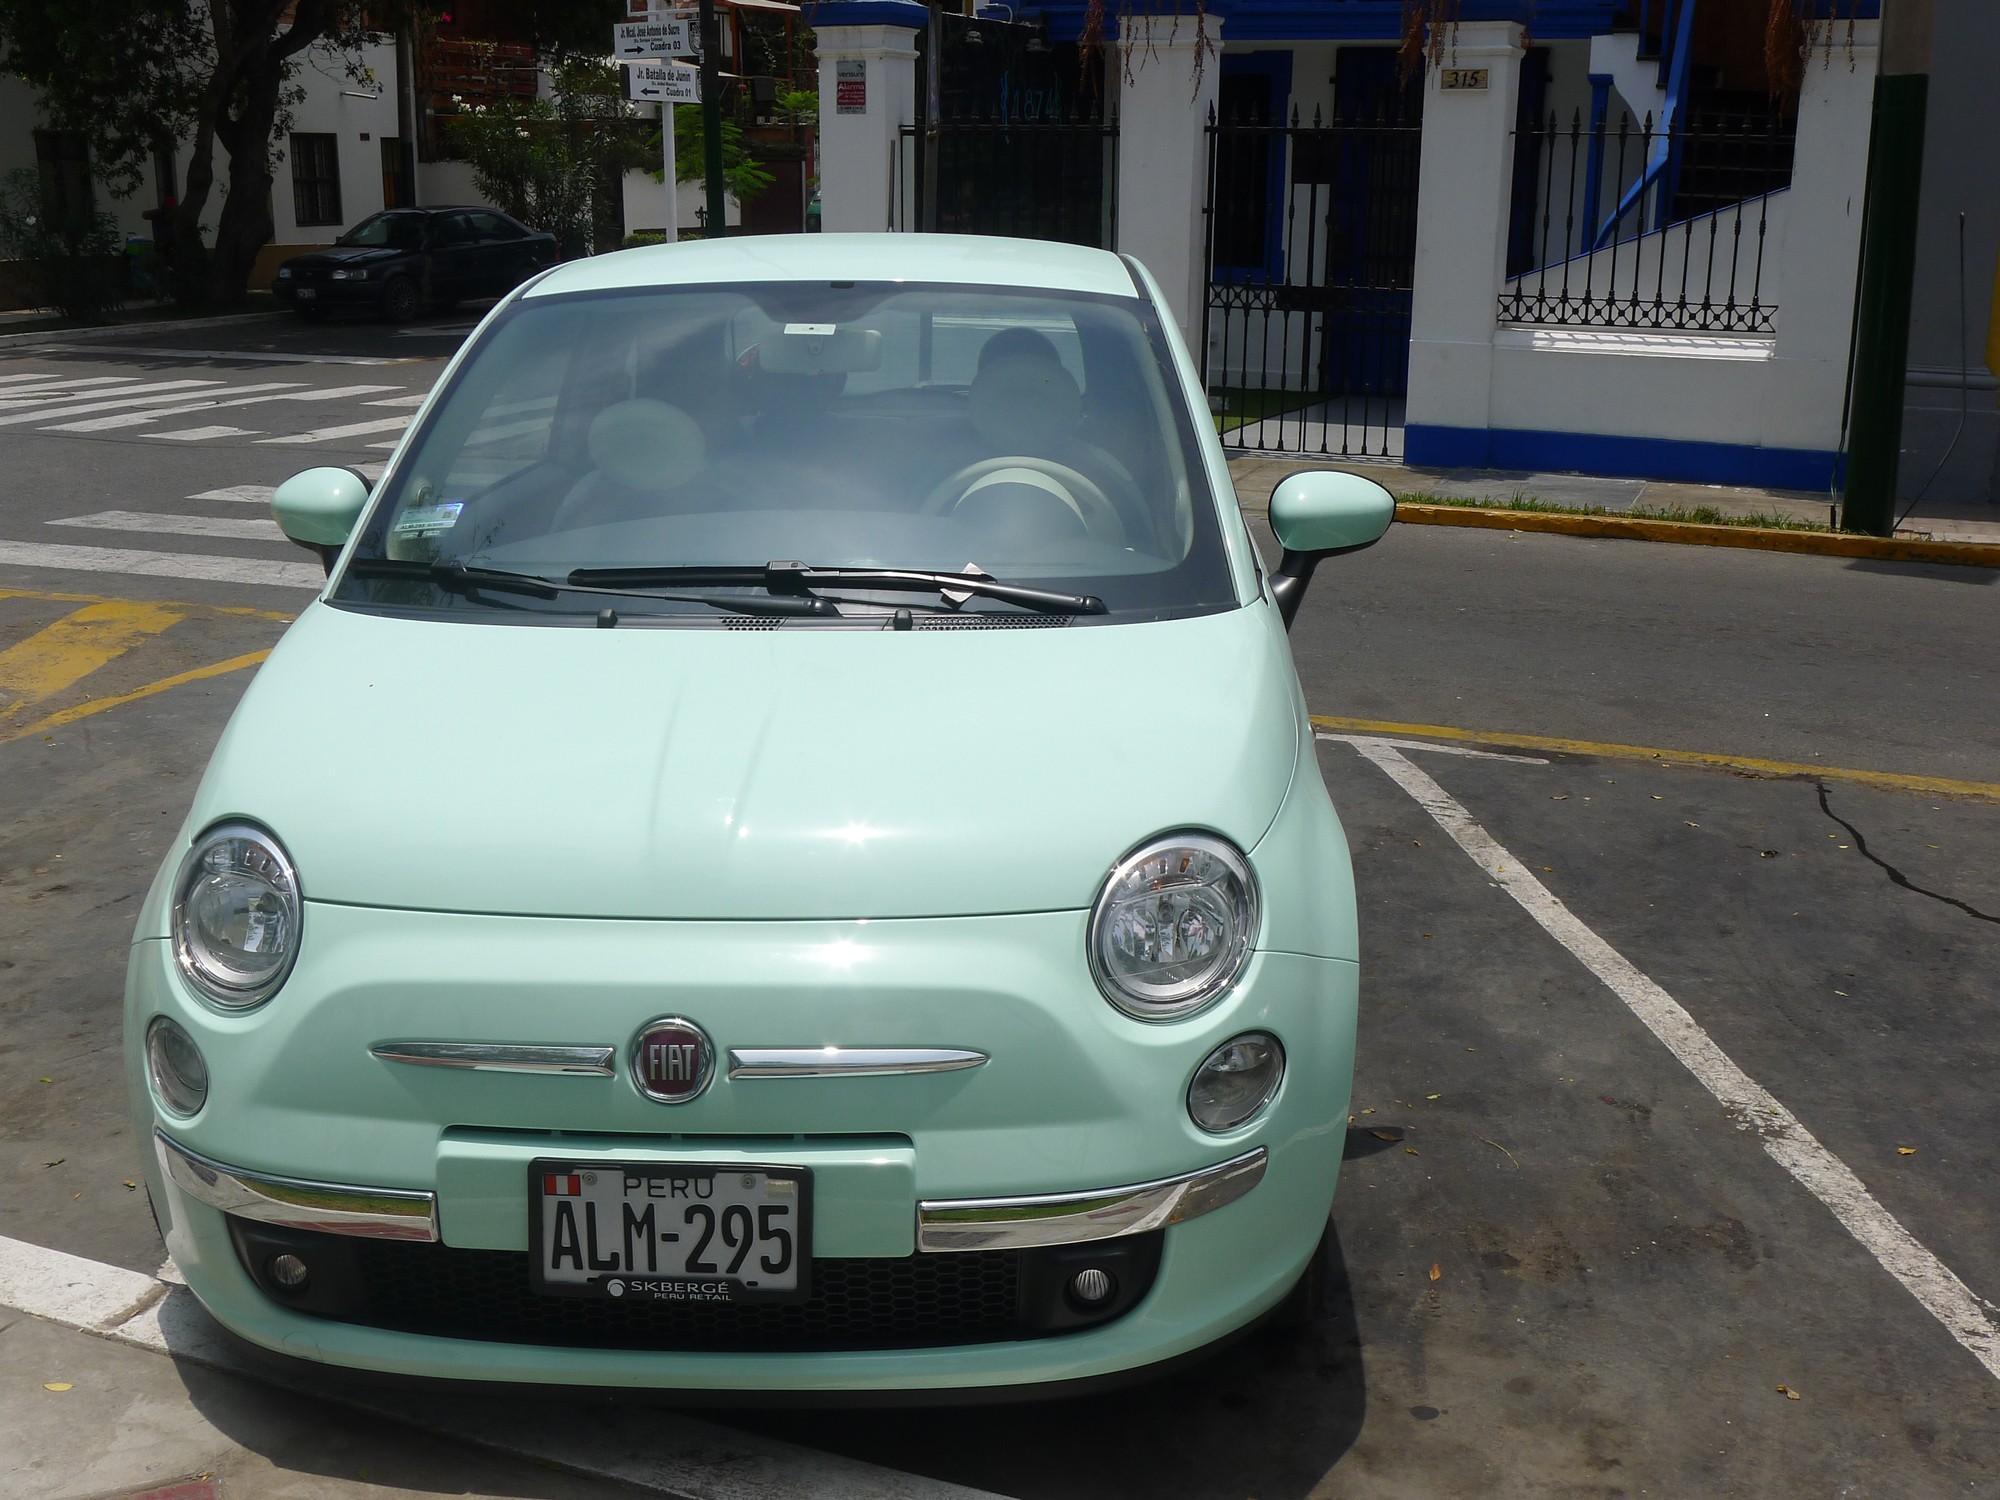 Mint green car